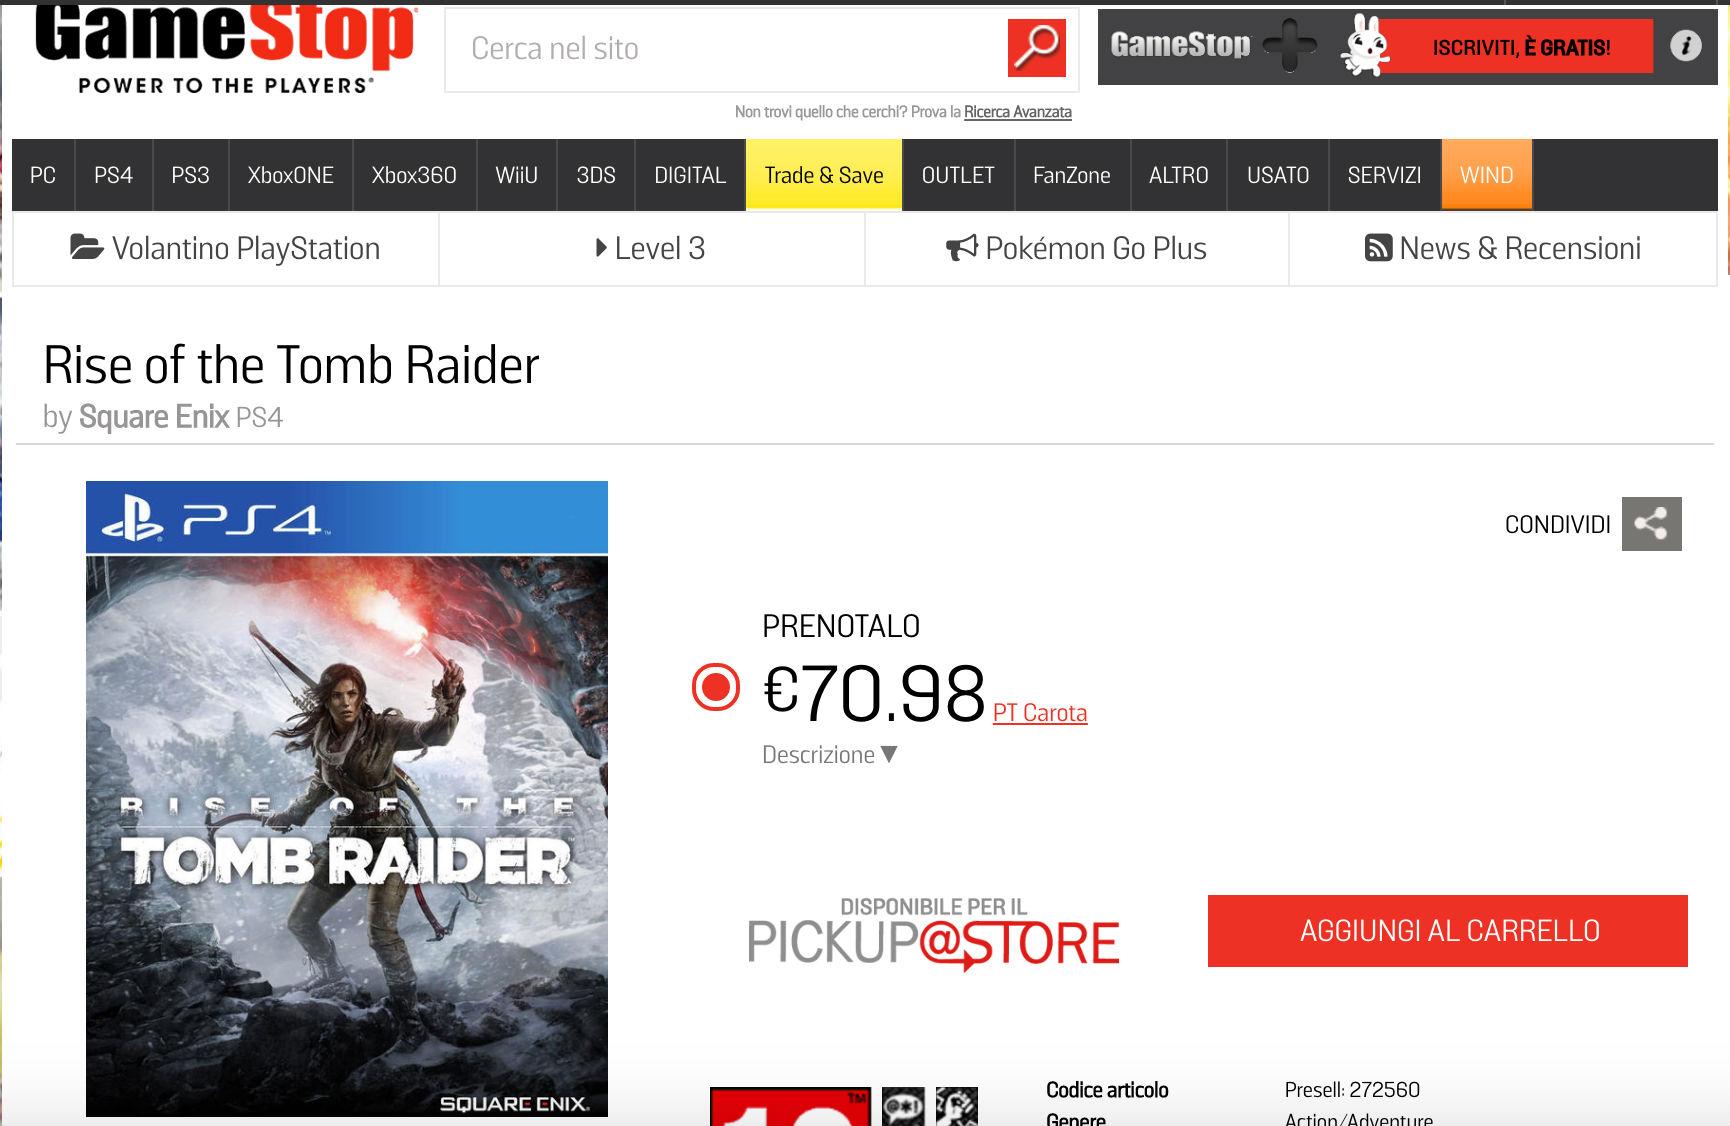 Tomb Raider_gamestop